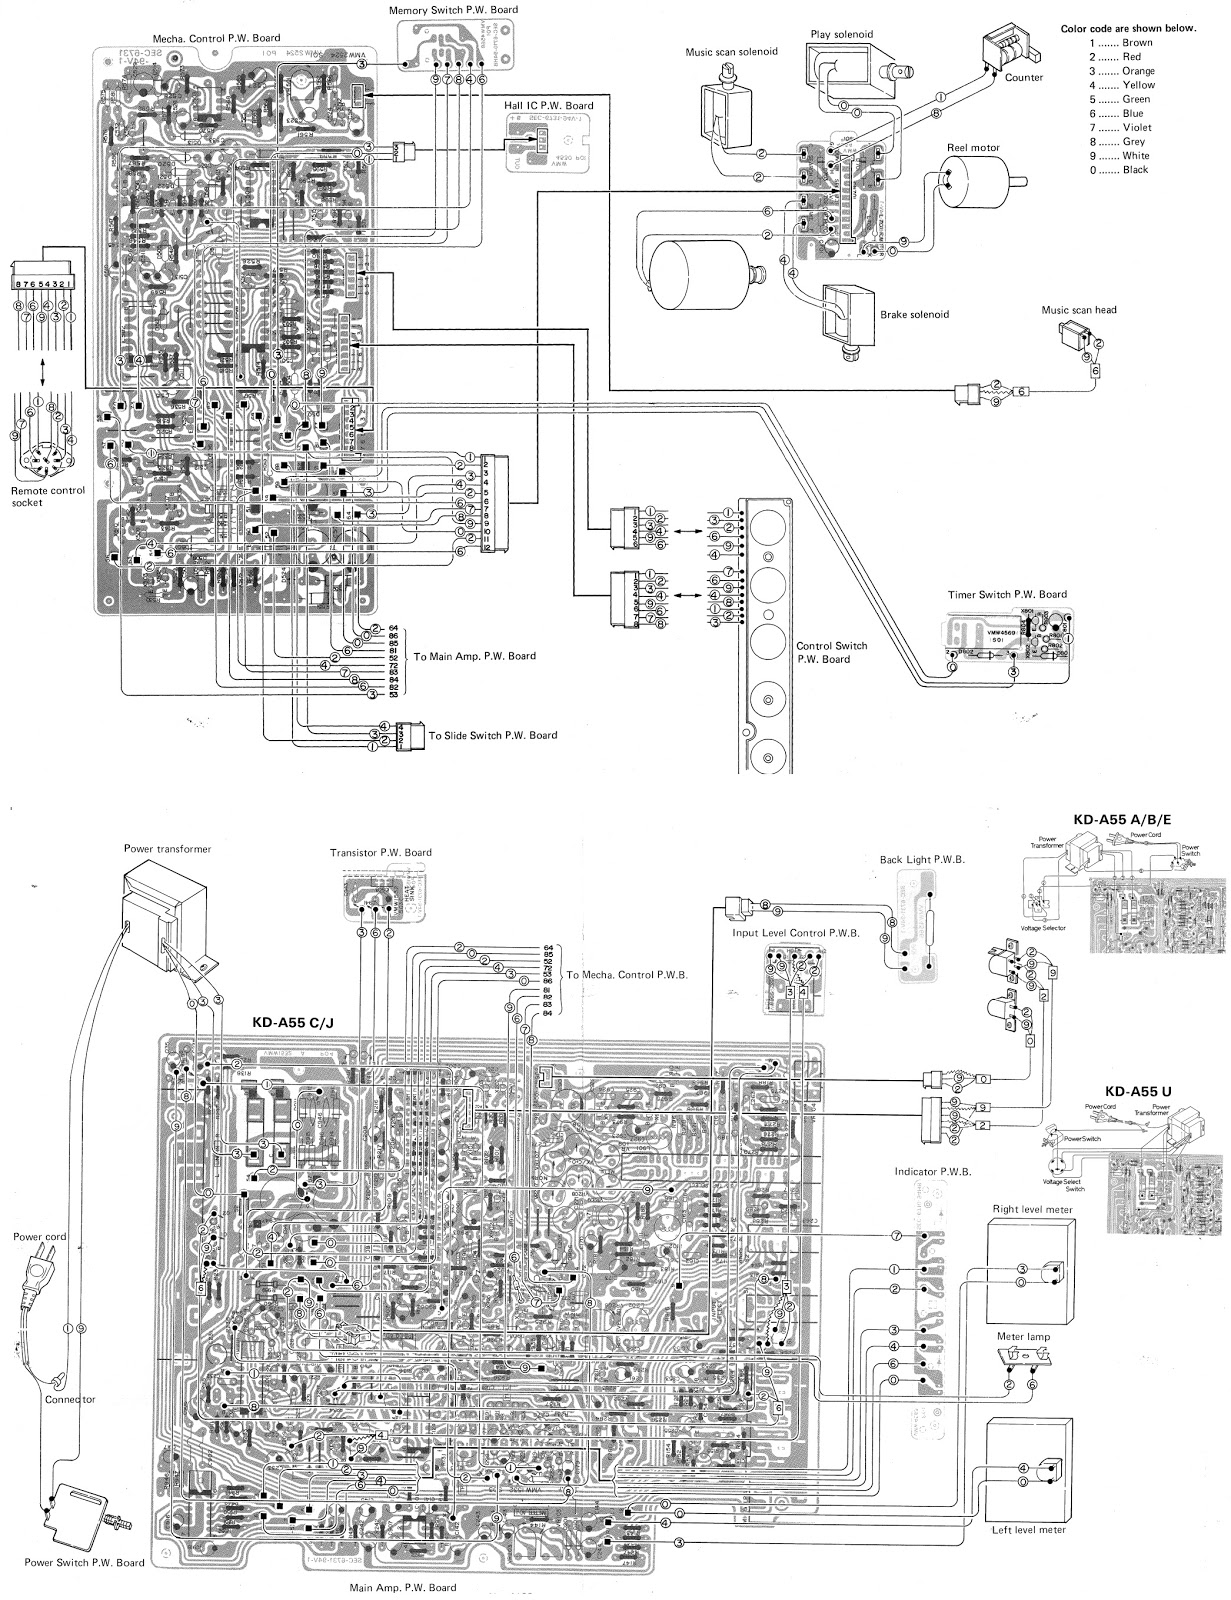 hight resolution of jvc deck wiring diagram 19 sg dbd de u2022jvc kd a55 gradient cd6500 tape deck